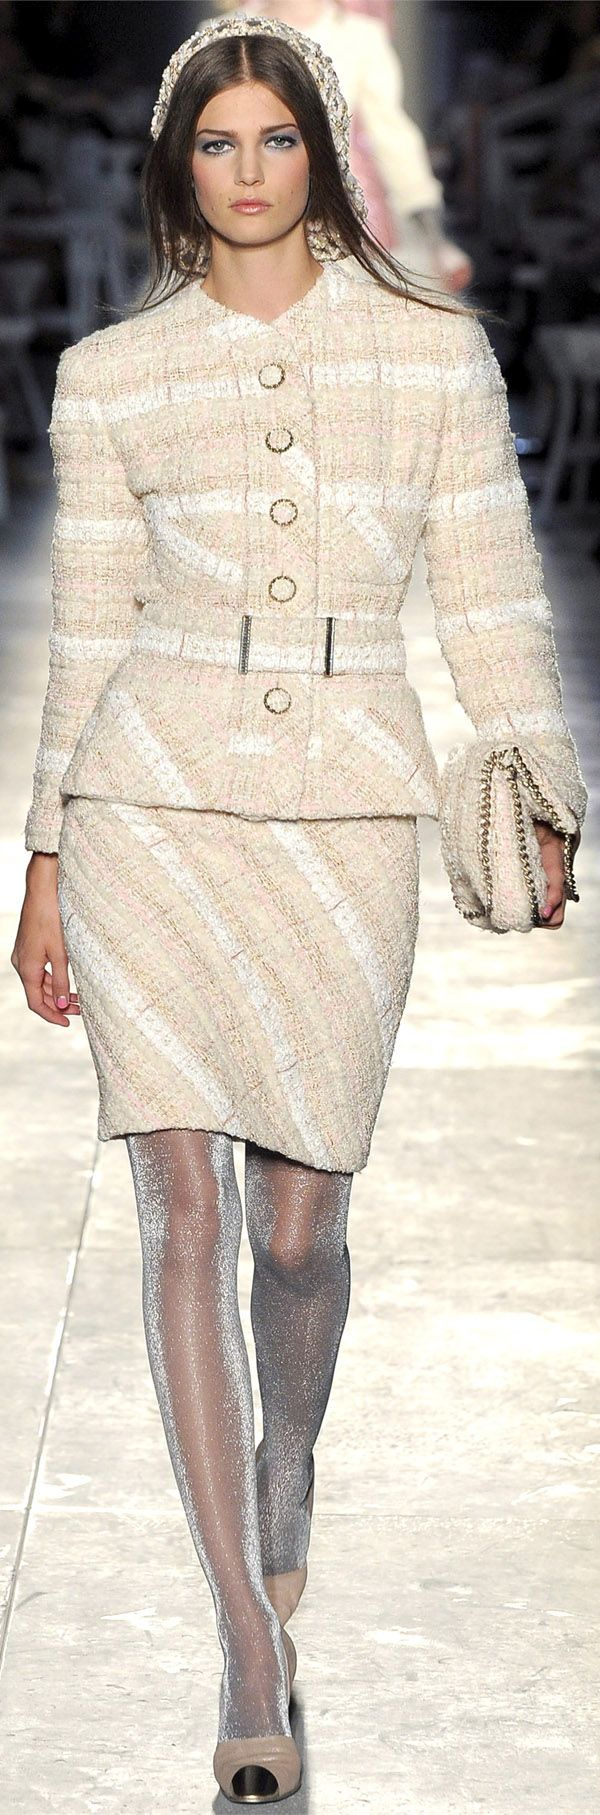 Chanel Winter 2013